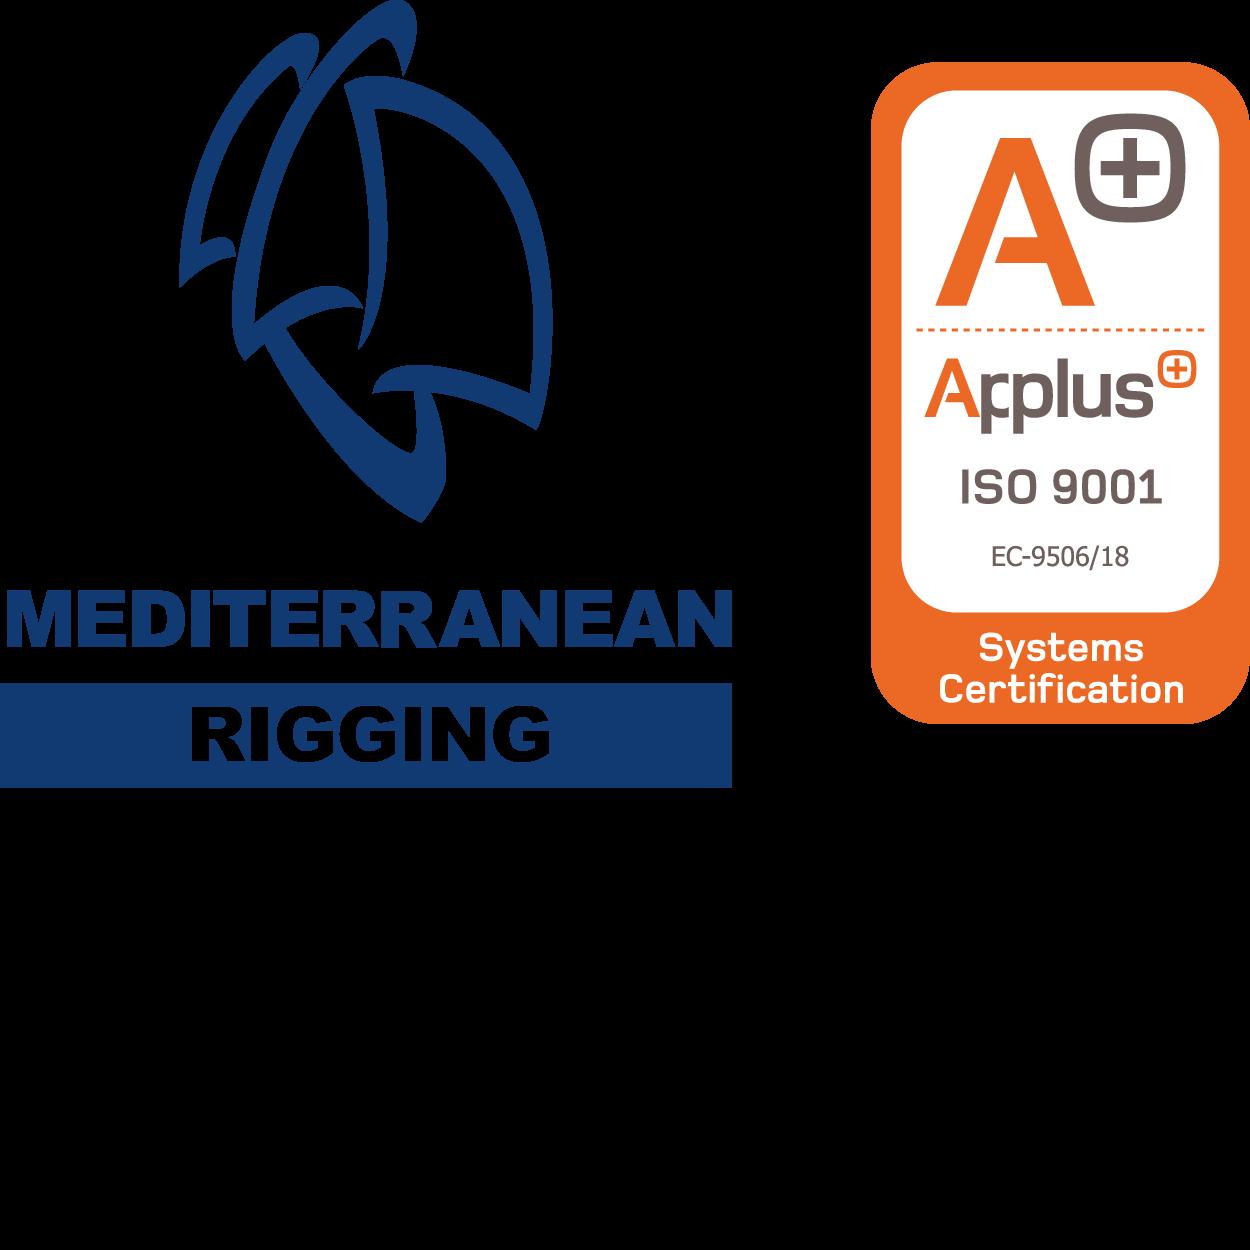 Mediterranean Rigging